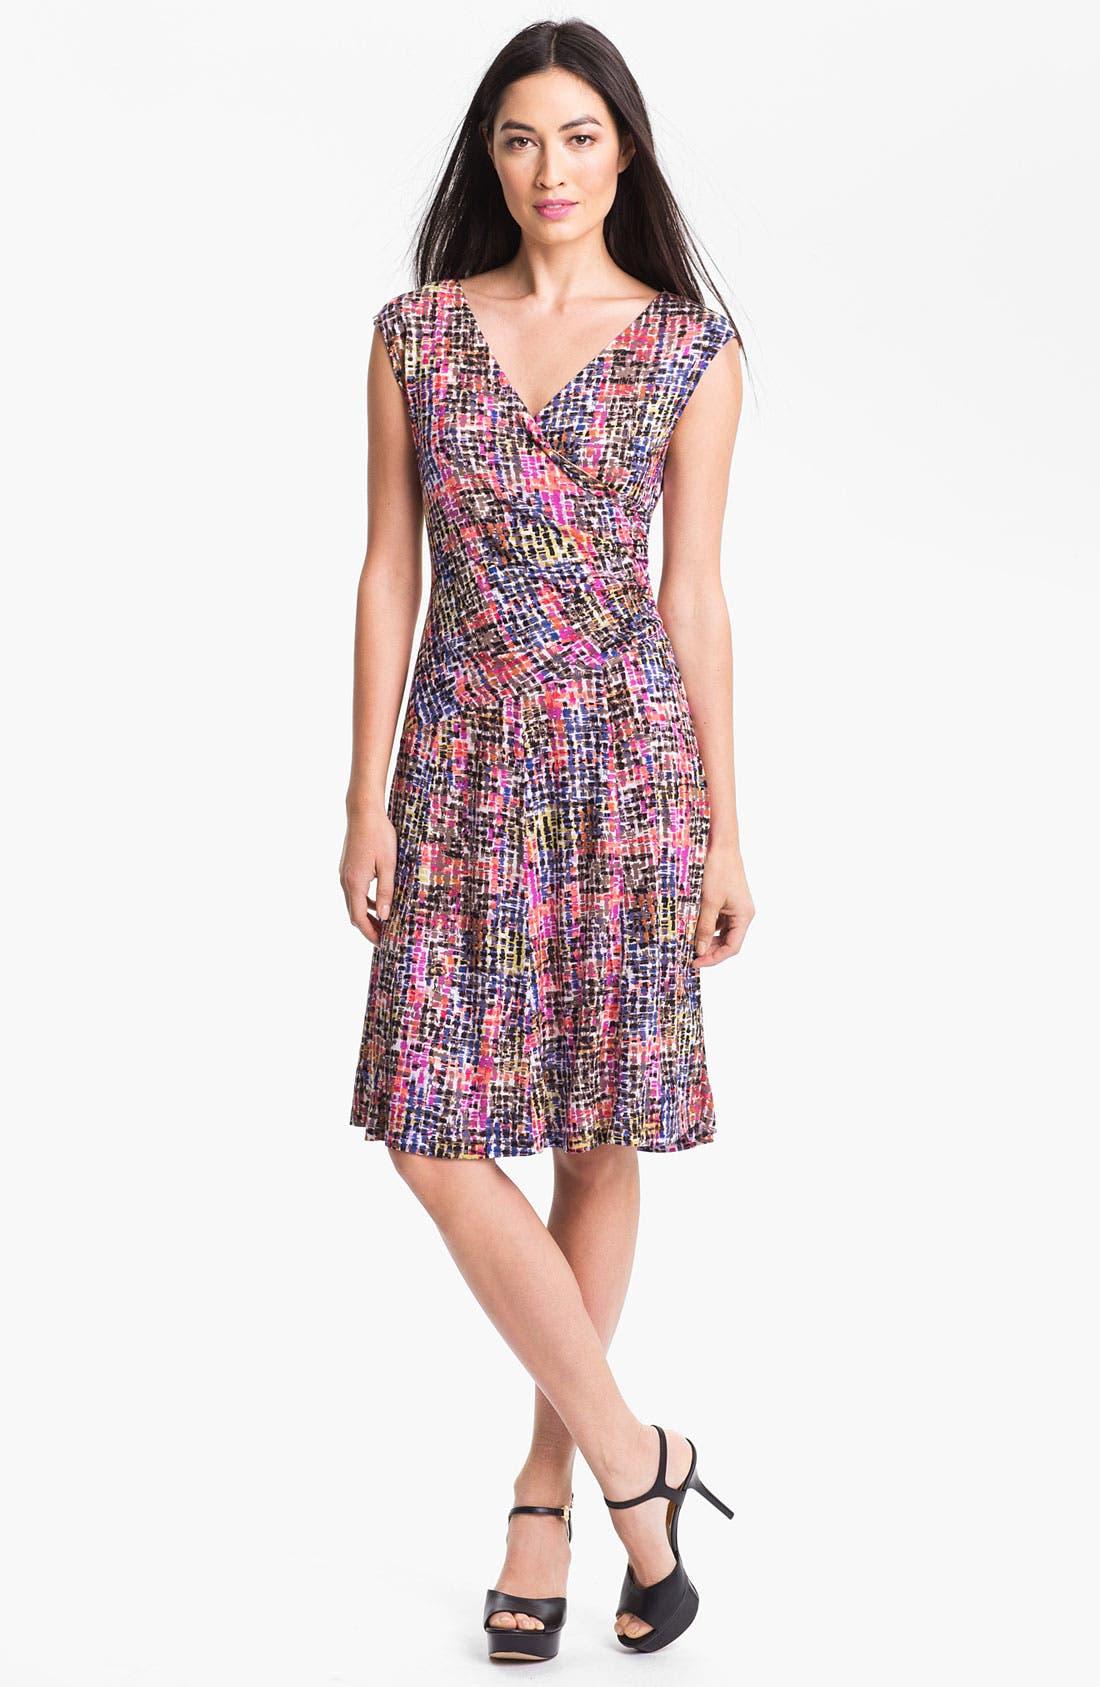 Main Image - Nic + Zoe 'Tiny Squares' Dress